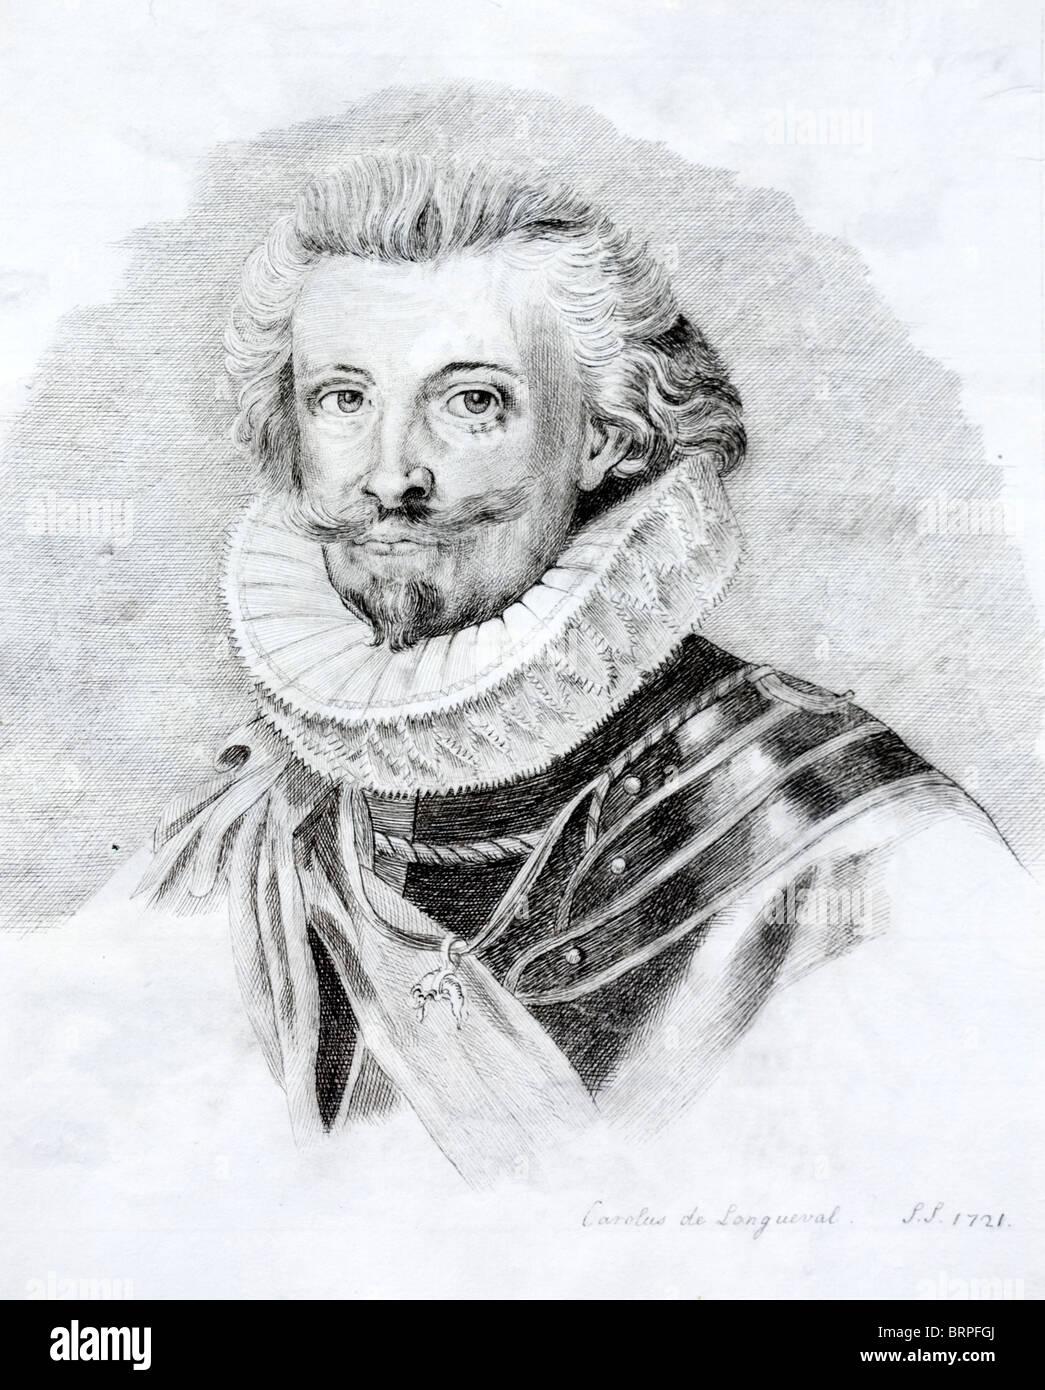 Charles Bonaventure de Longueval, 2nd Count of Bucquoy